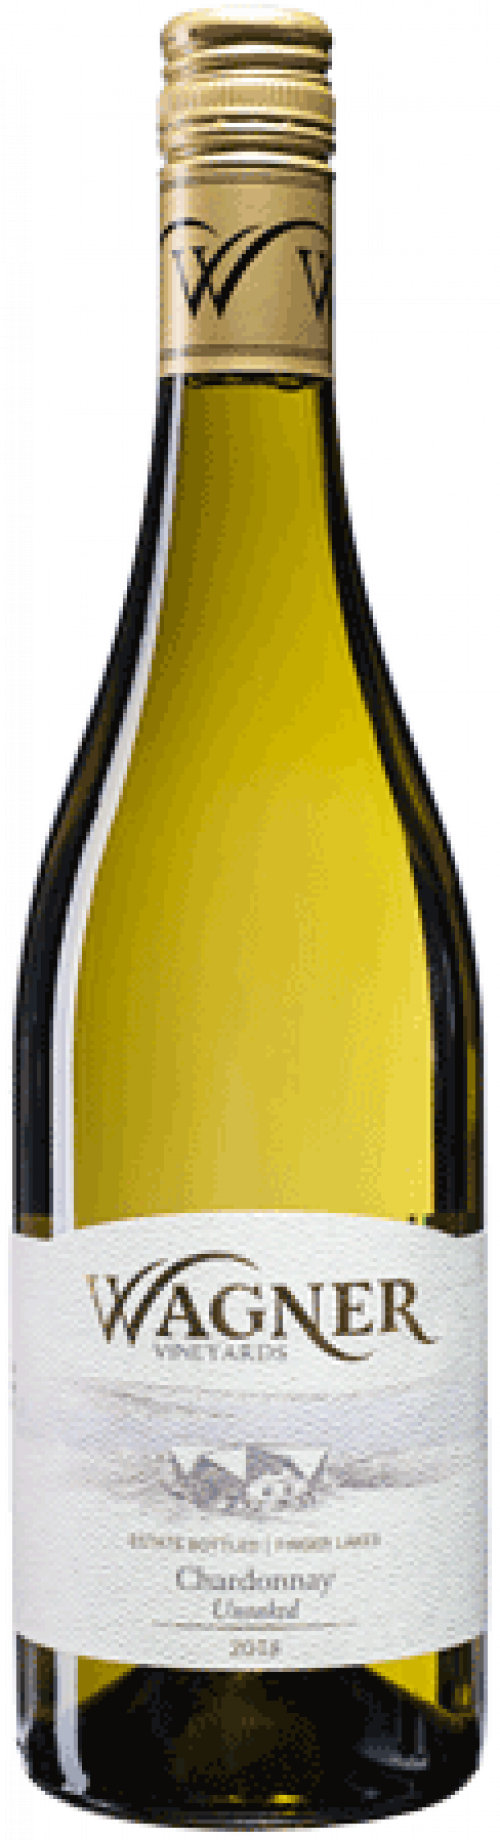 2018 Wagner Unoaked Chardonnay 750ml